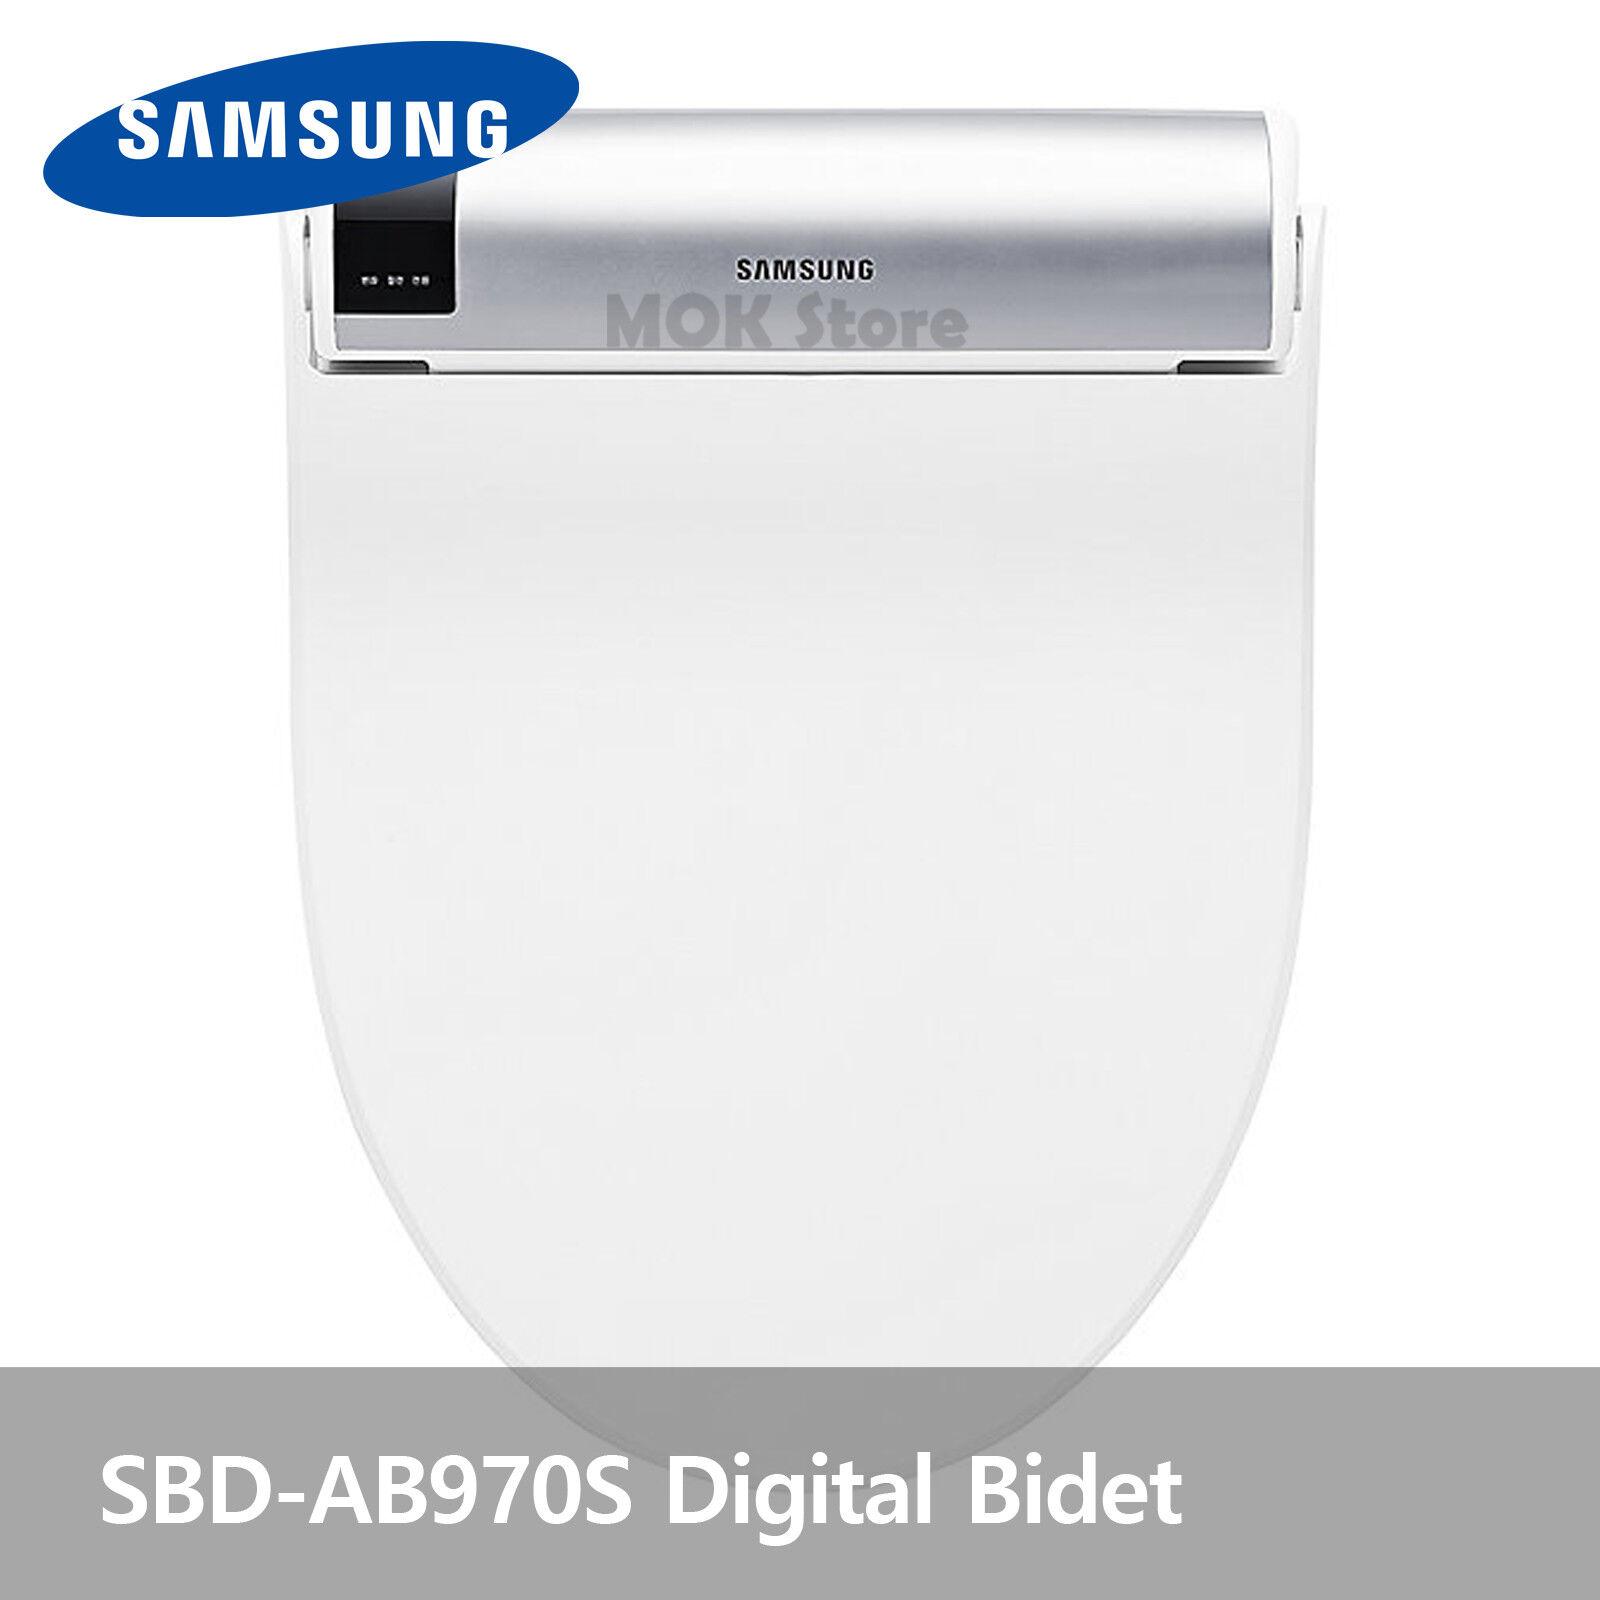 Admirable Details About Samsung Sbd Ab970S Digital Electronic Bidet Toilet Seat Remote Dryer Short Links Chair Design For Home Short Linksinfo